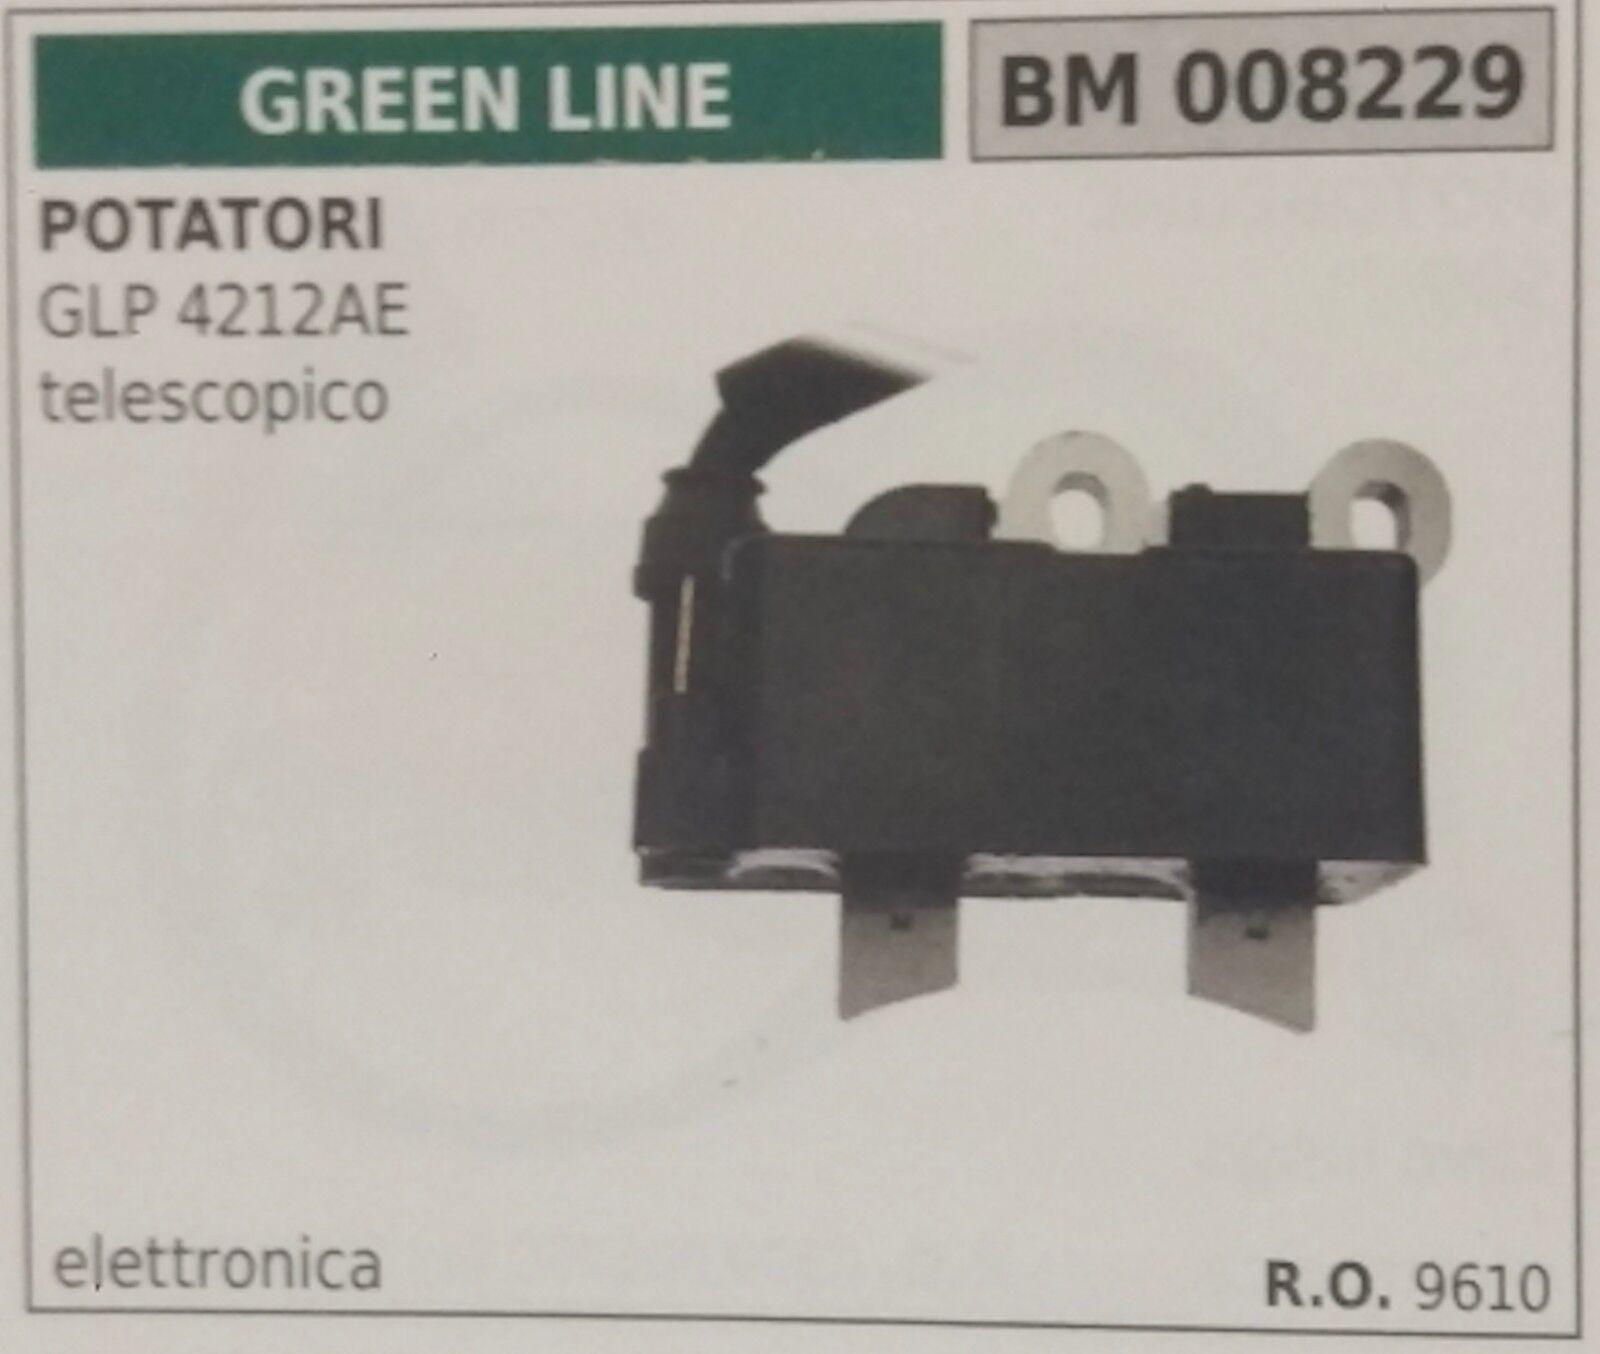 9610 BOBINA ELETTRONICA POTATORE potatrice verde LINE GLP 4212AE TELESCOPICO